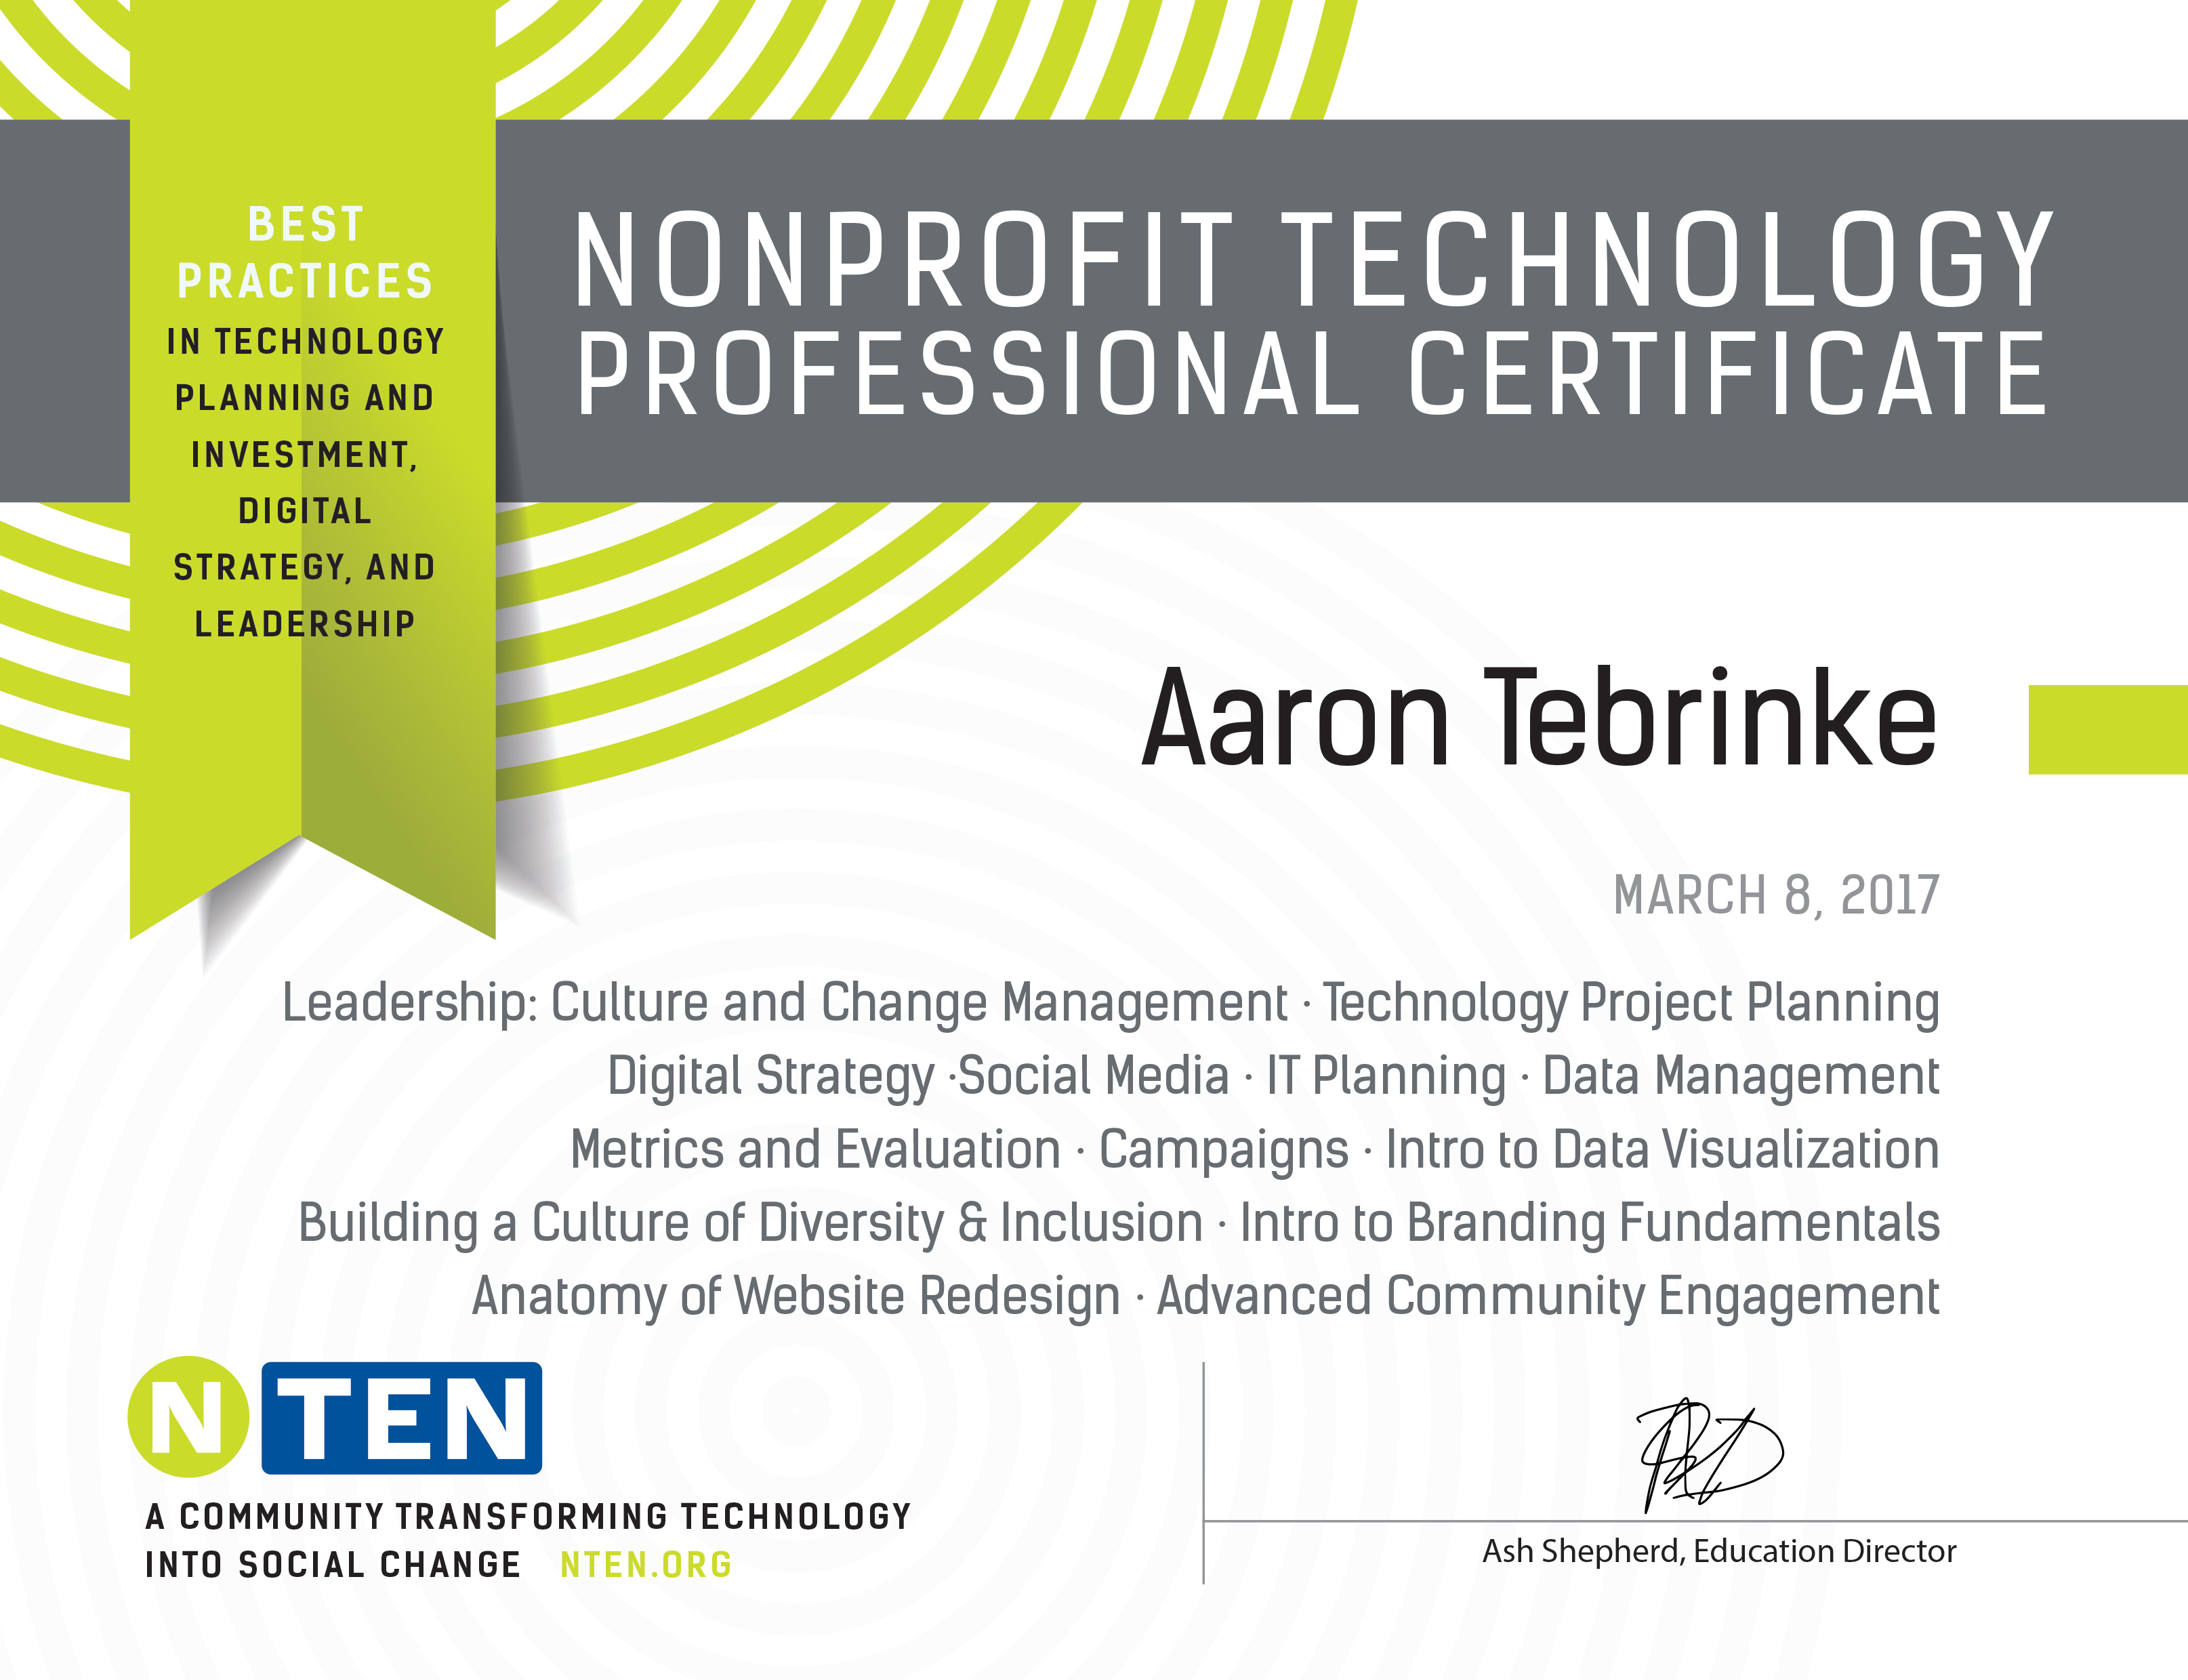 certification aaron tebrinke multimedia specialist